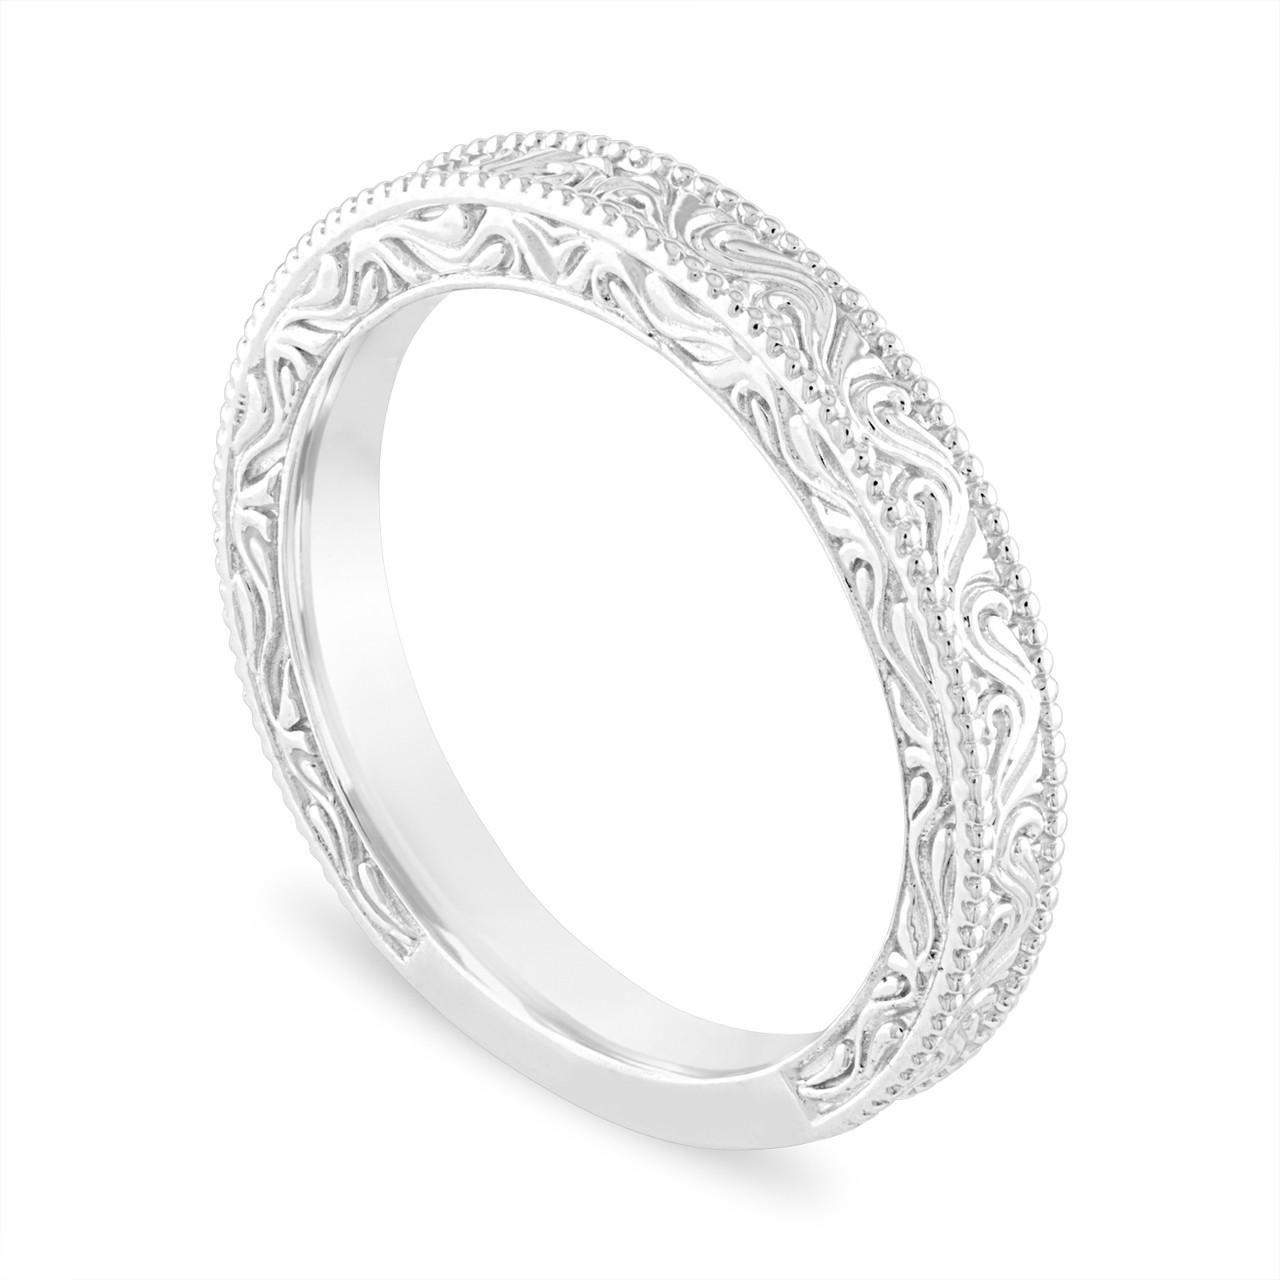 Filigree Wedding Band Vintage Ring Anniversary Antique Style Engraved 14k White Gold Handmade: Antique Filigree Wedding Rings At Reisefeber.org